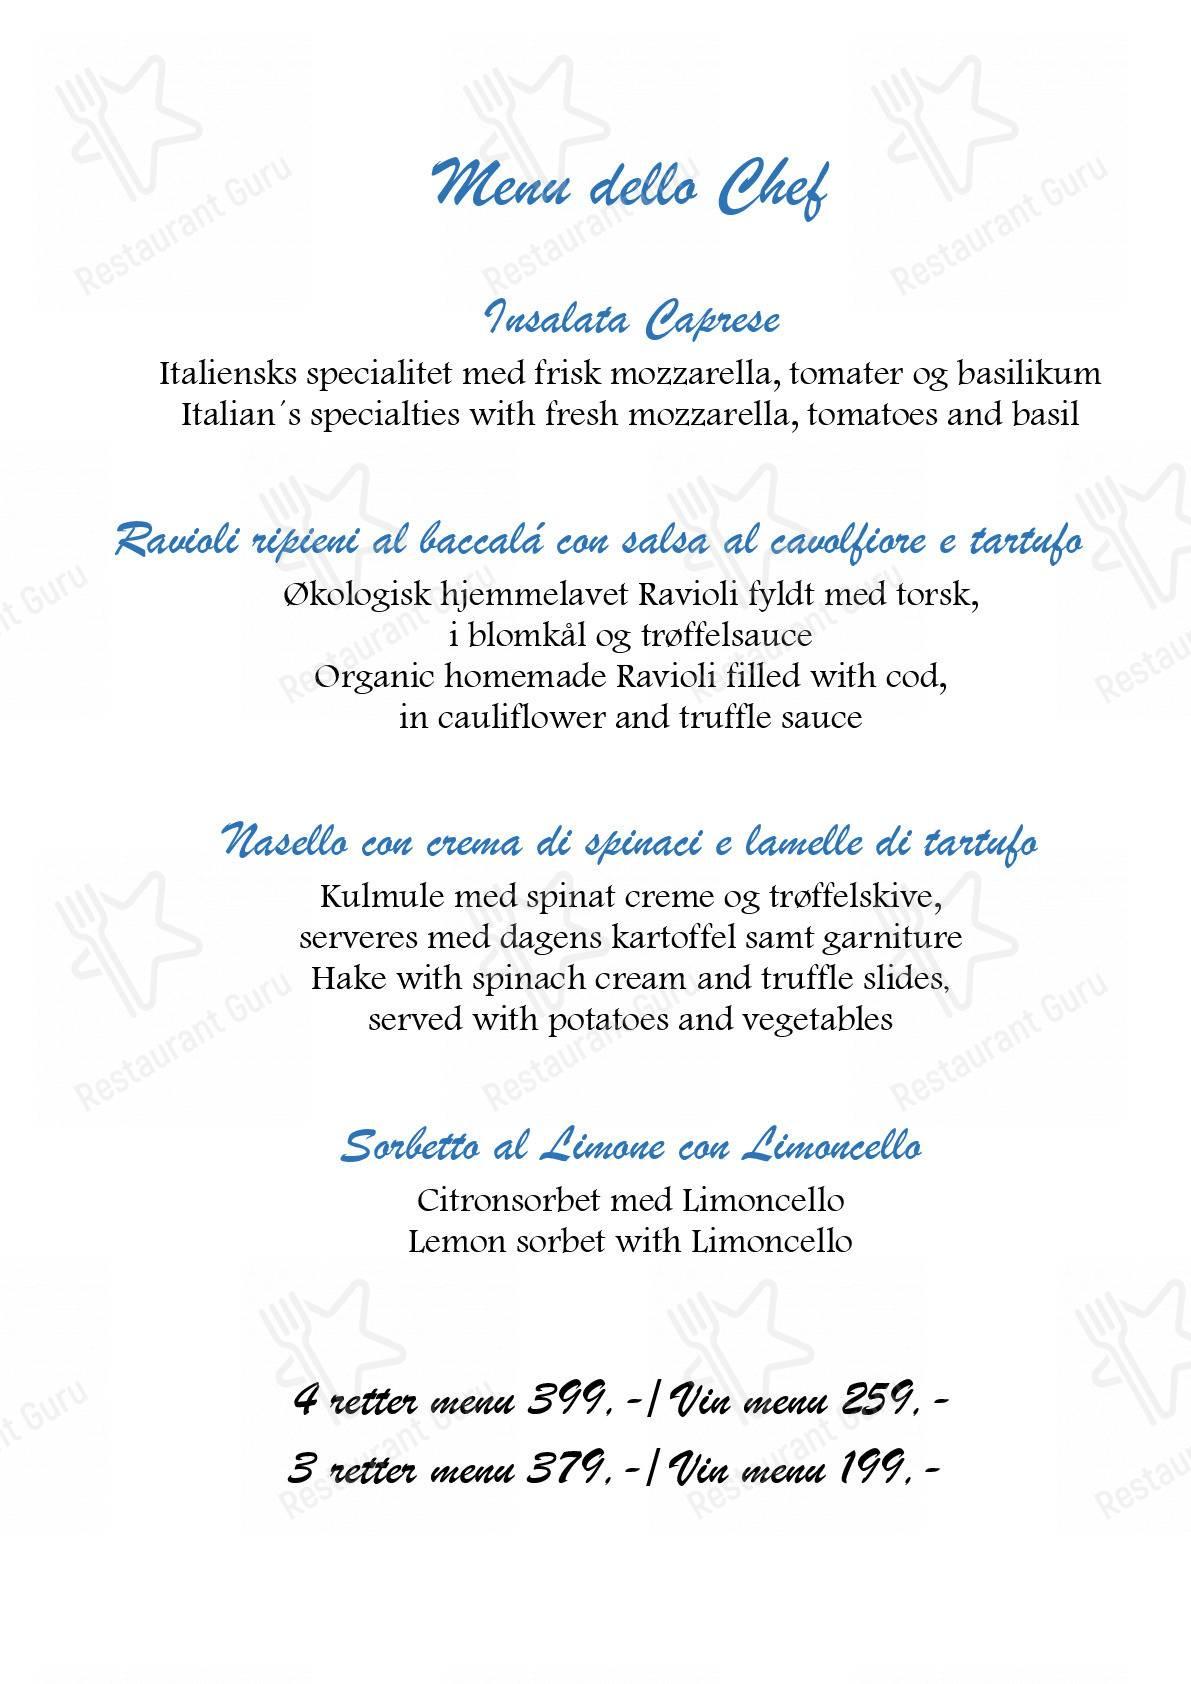 La Dolce Vita menu - meals and drinks